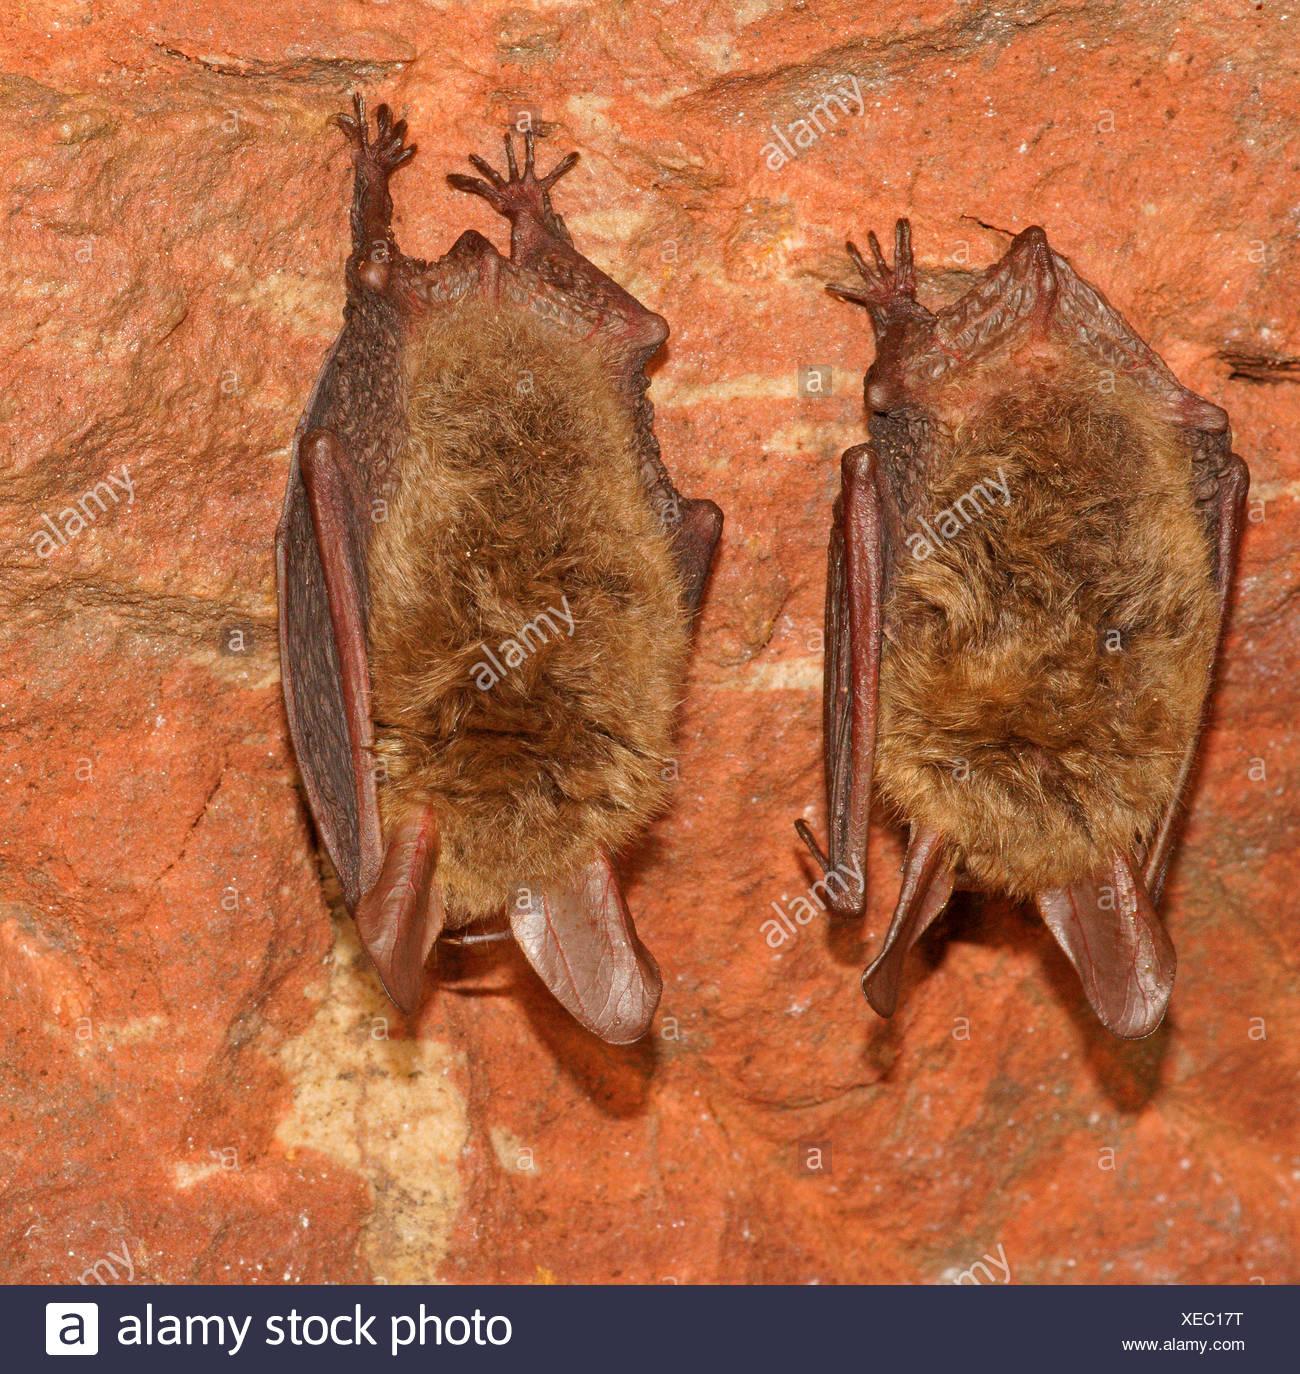 Bechstein's Bats (Myotis bechsteinii) in hibernation, Bad Hersfeld, Hesse, Germany - Stock Image